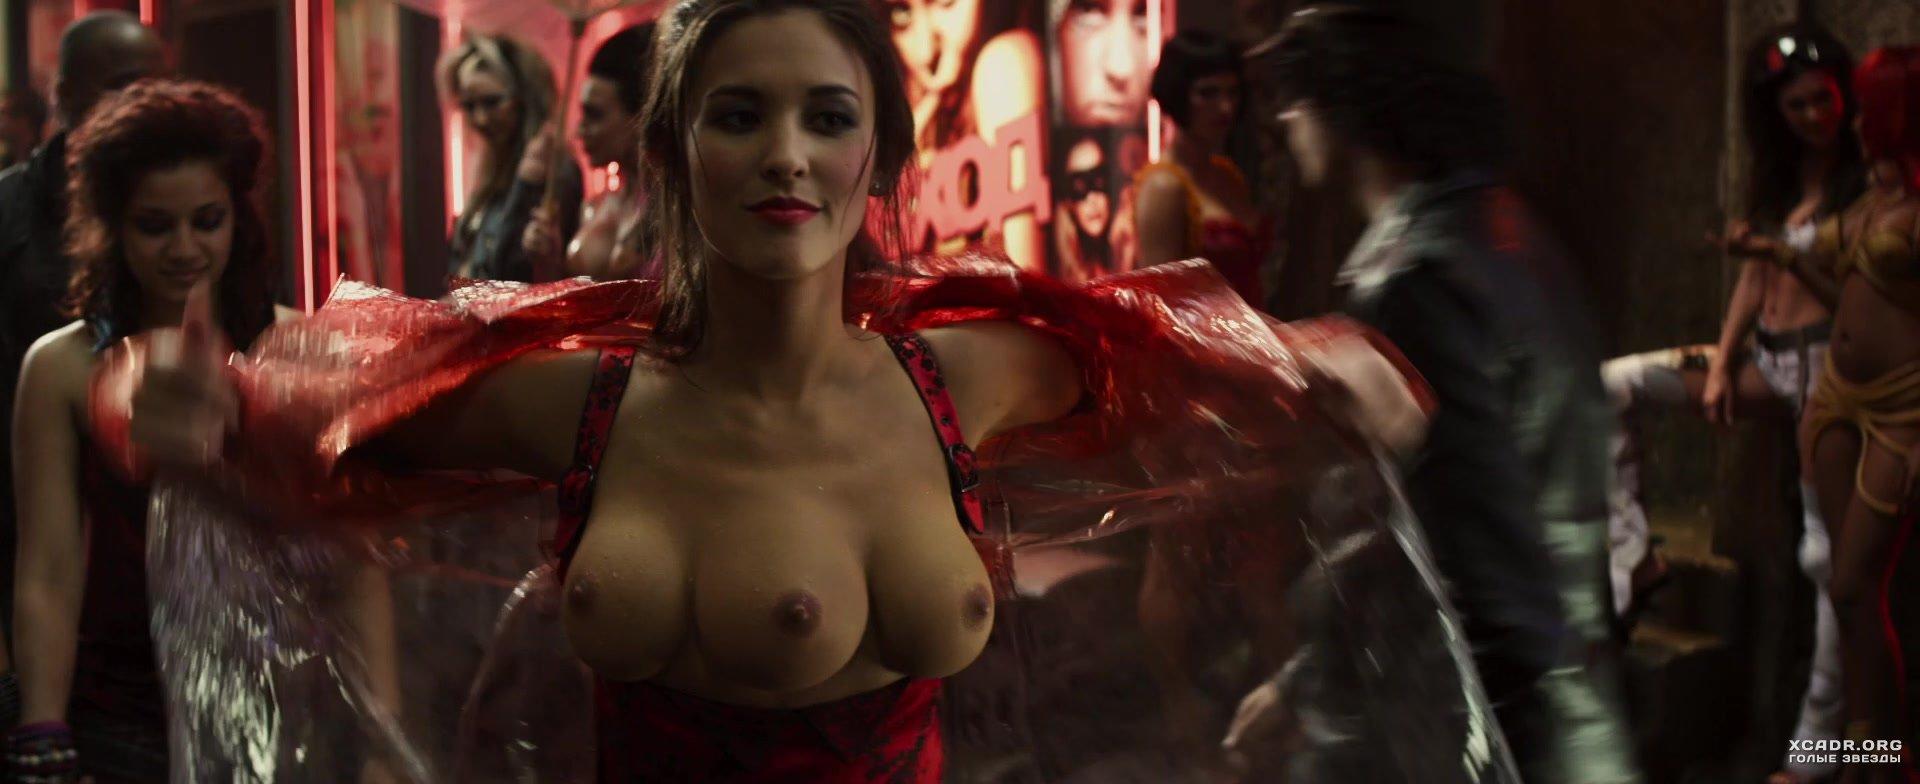 three-tits-movie-line-maiteperroni-porno